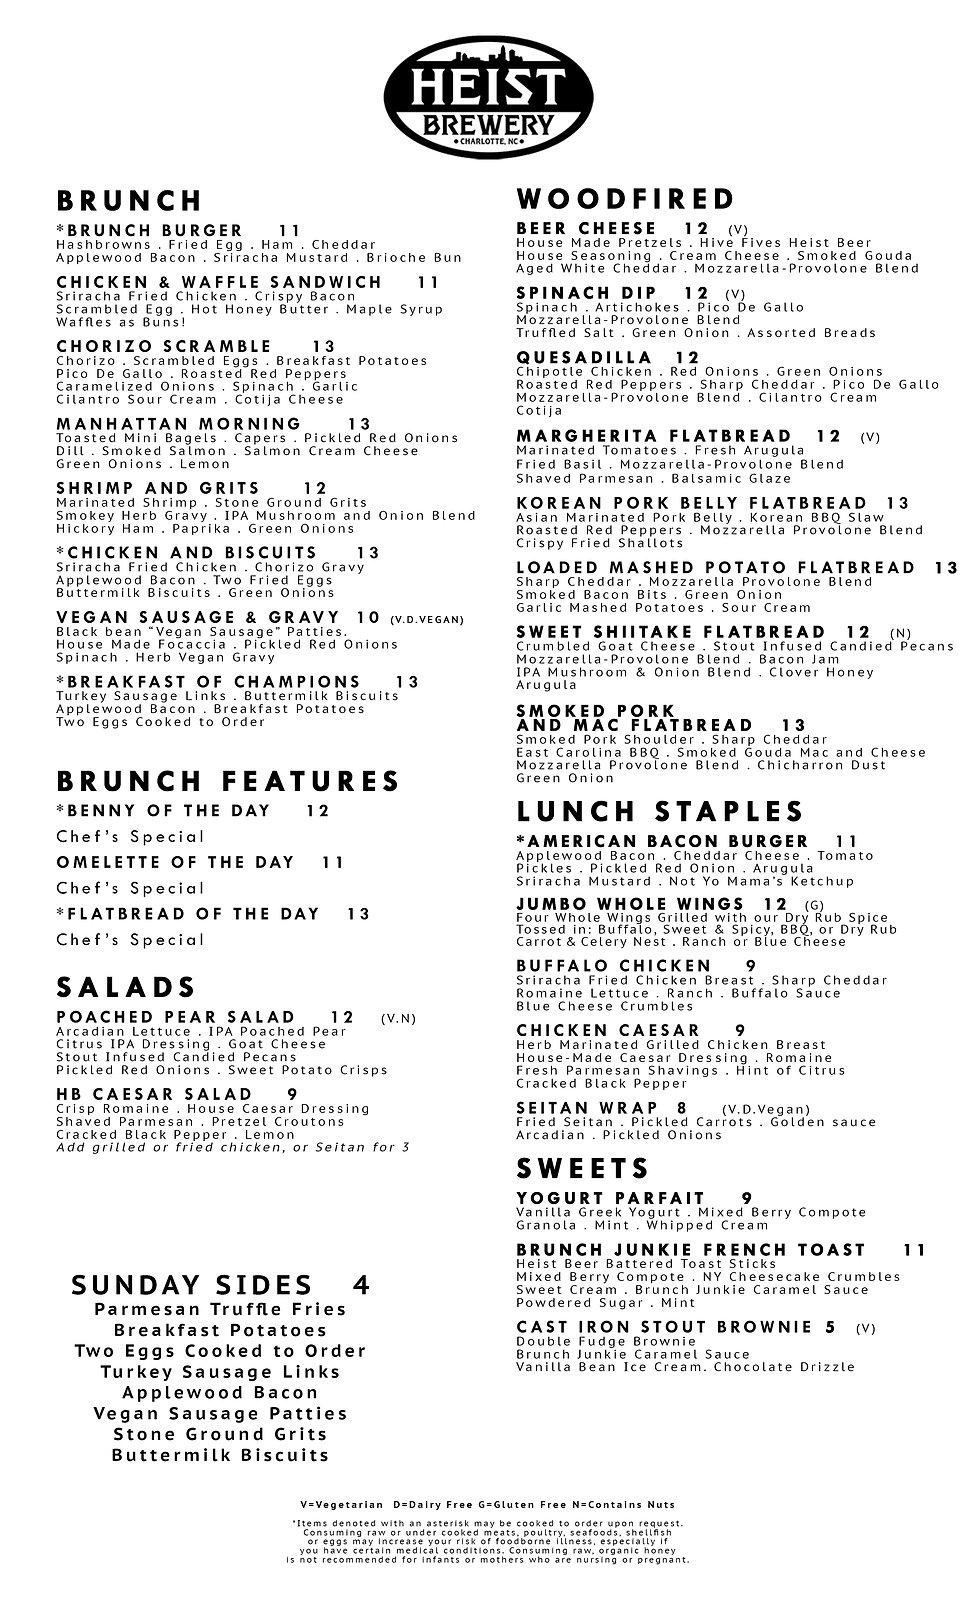 Covid food Web 2 Brunch.jpg